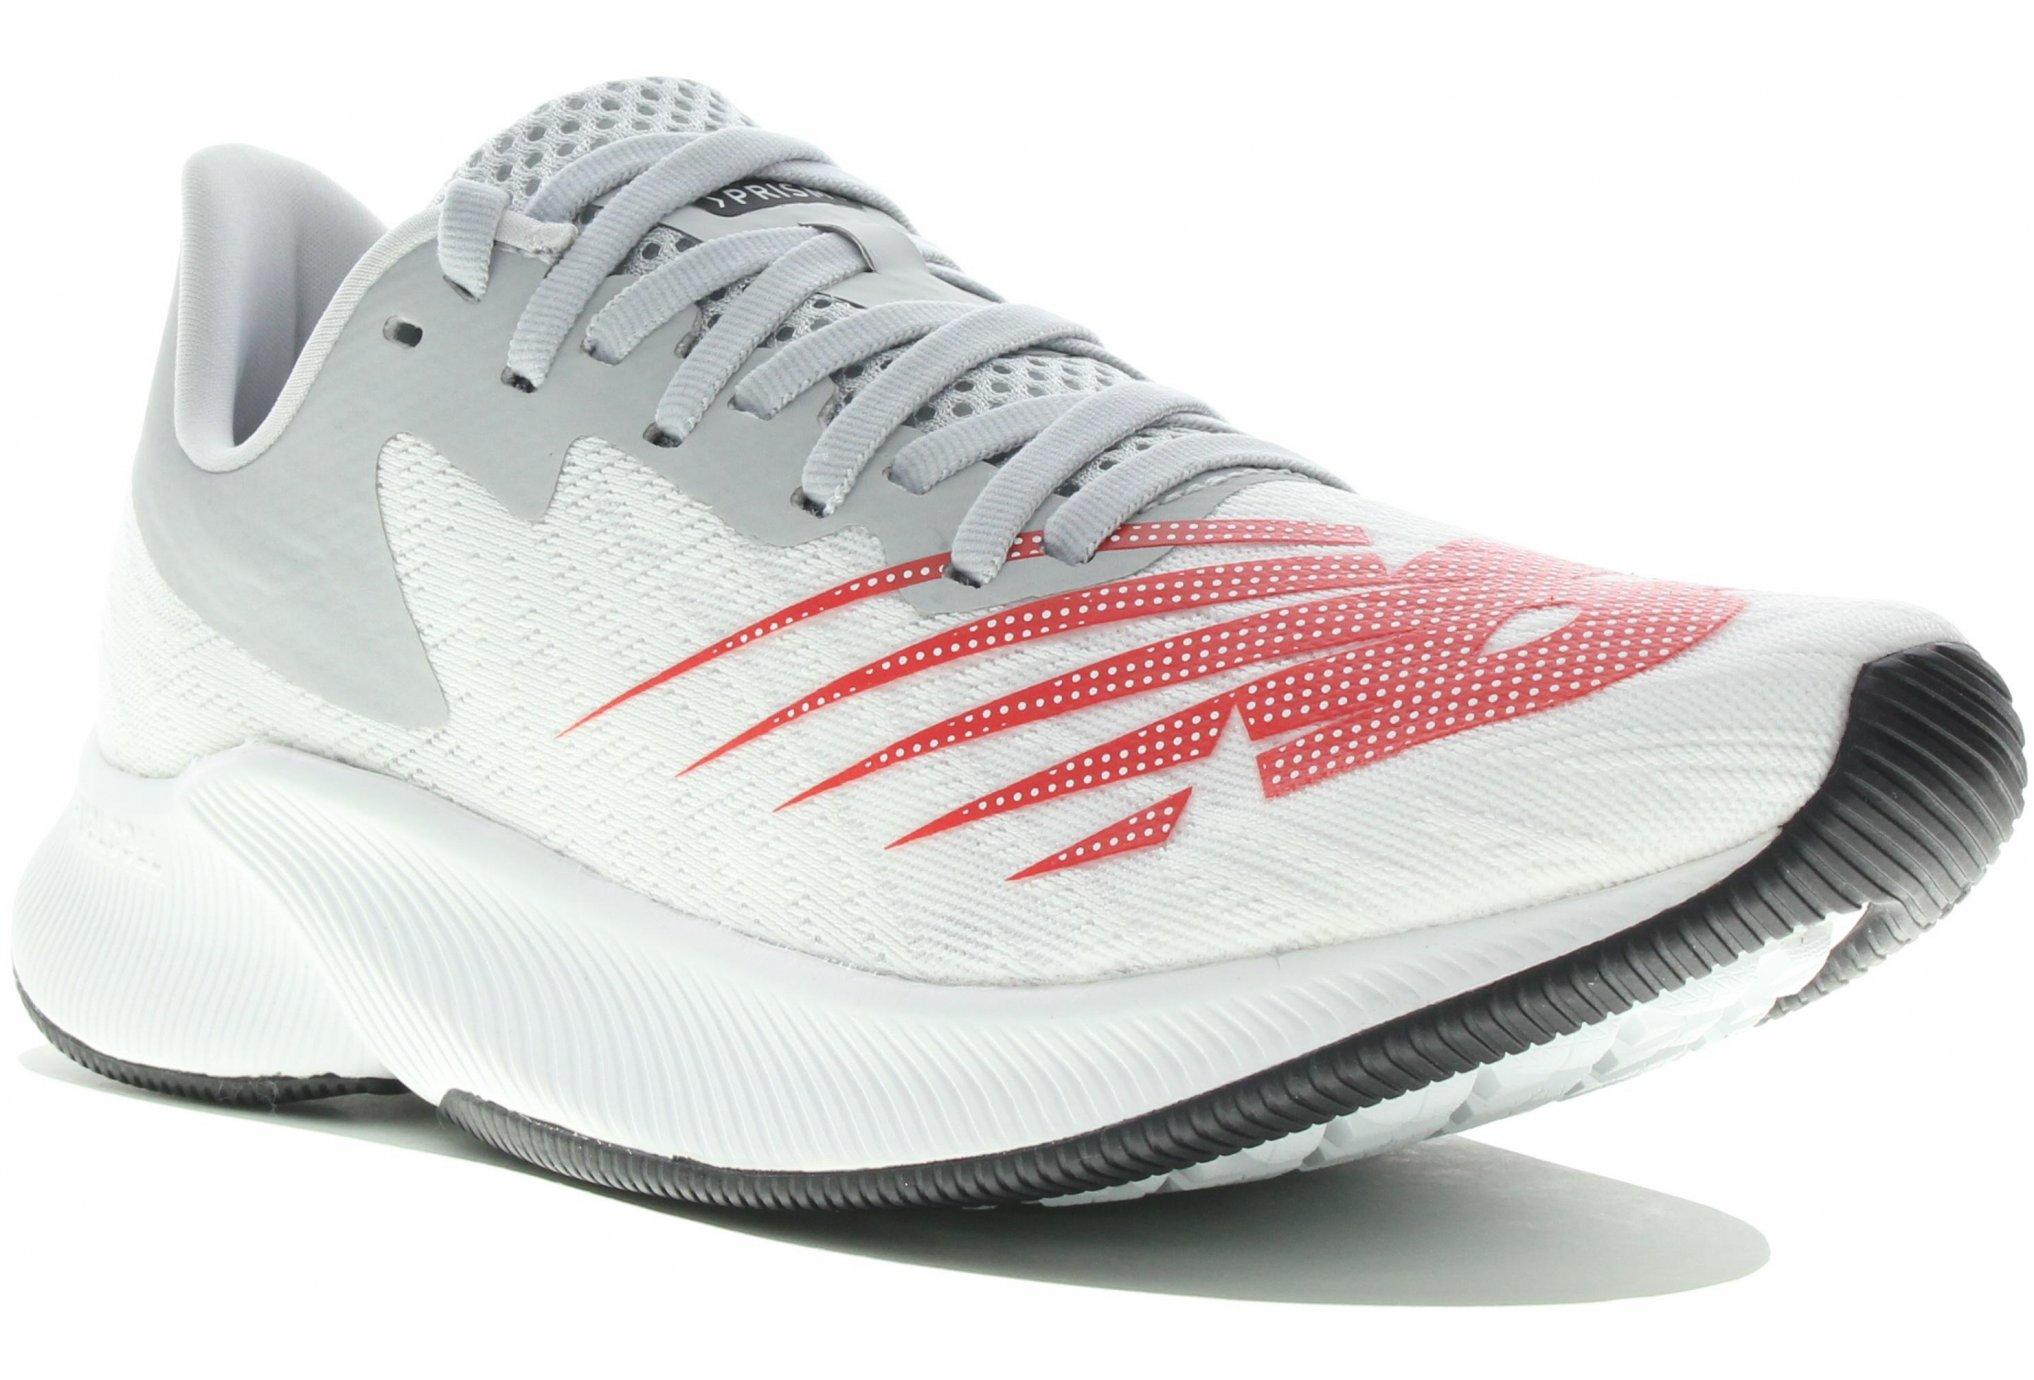 New Balance FuelCell Prism EnergyStreak W Chaussures running femme